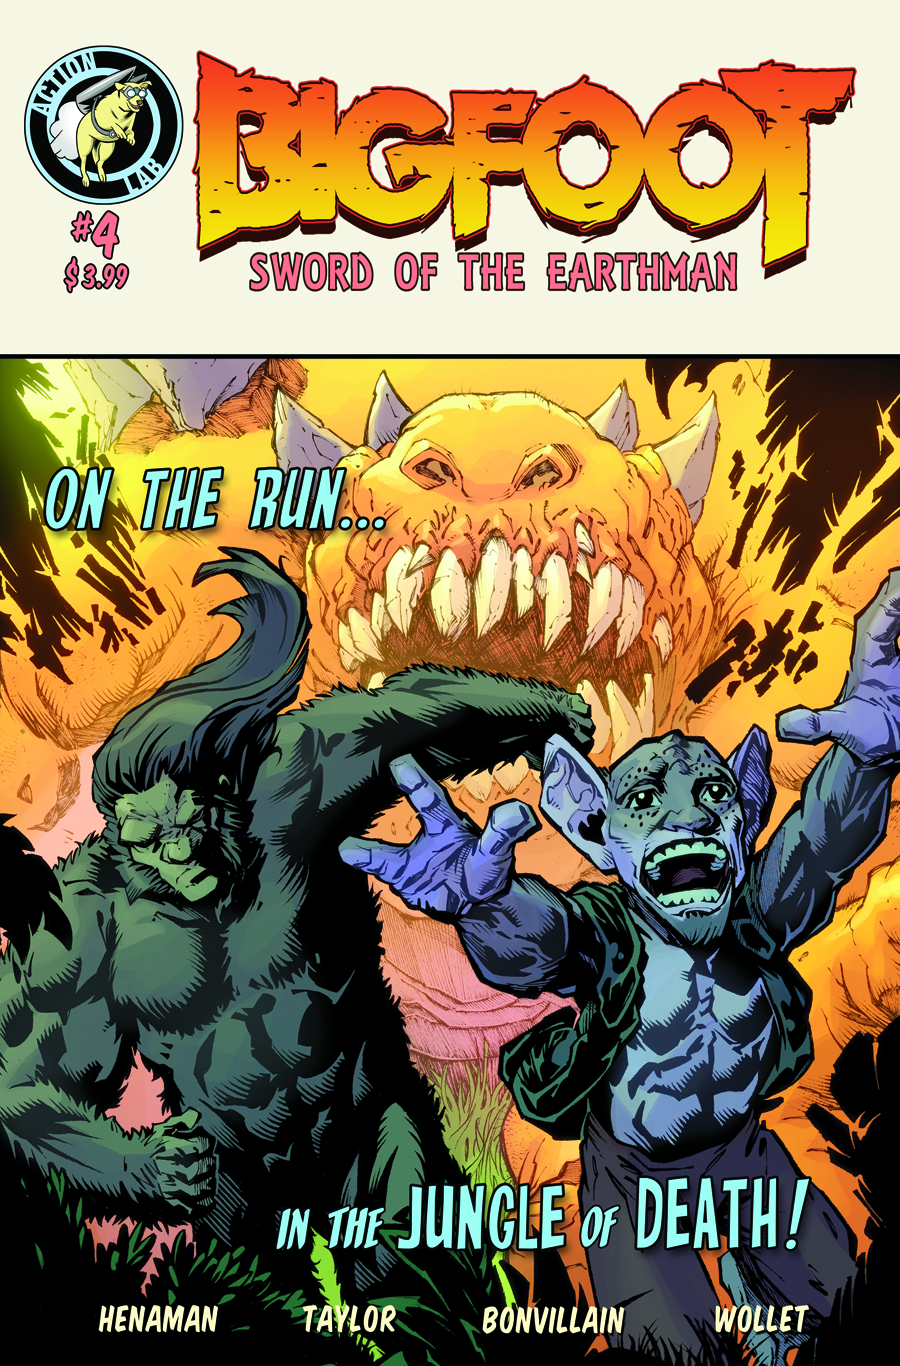 Bigfoot - Sword of the Earthman: January 2016Bigfoot Comic